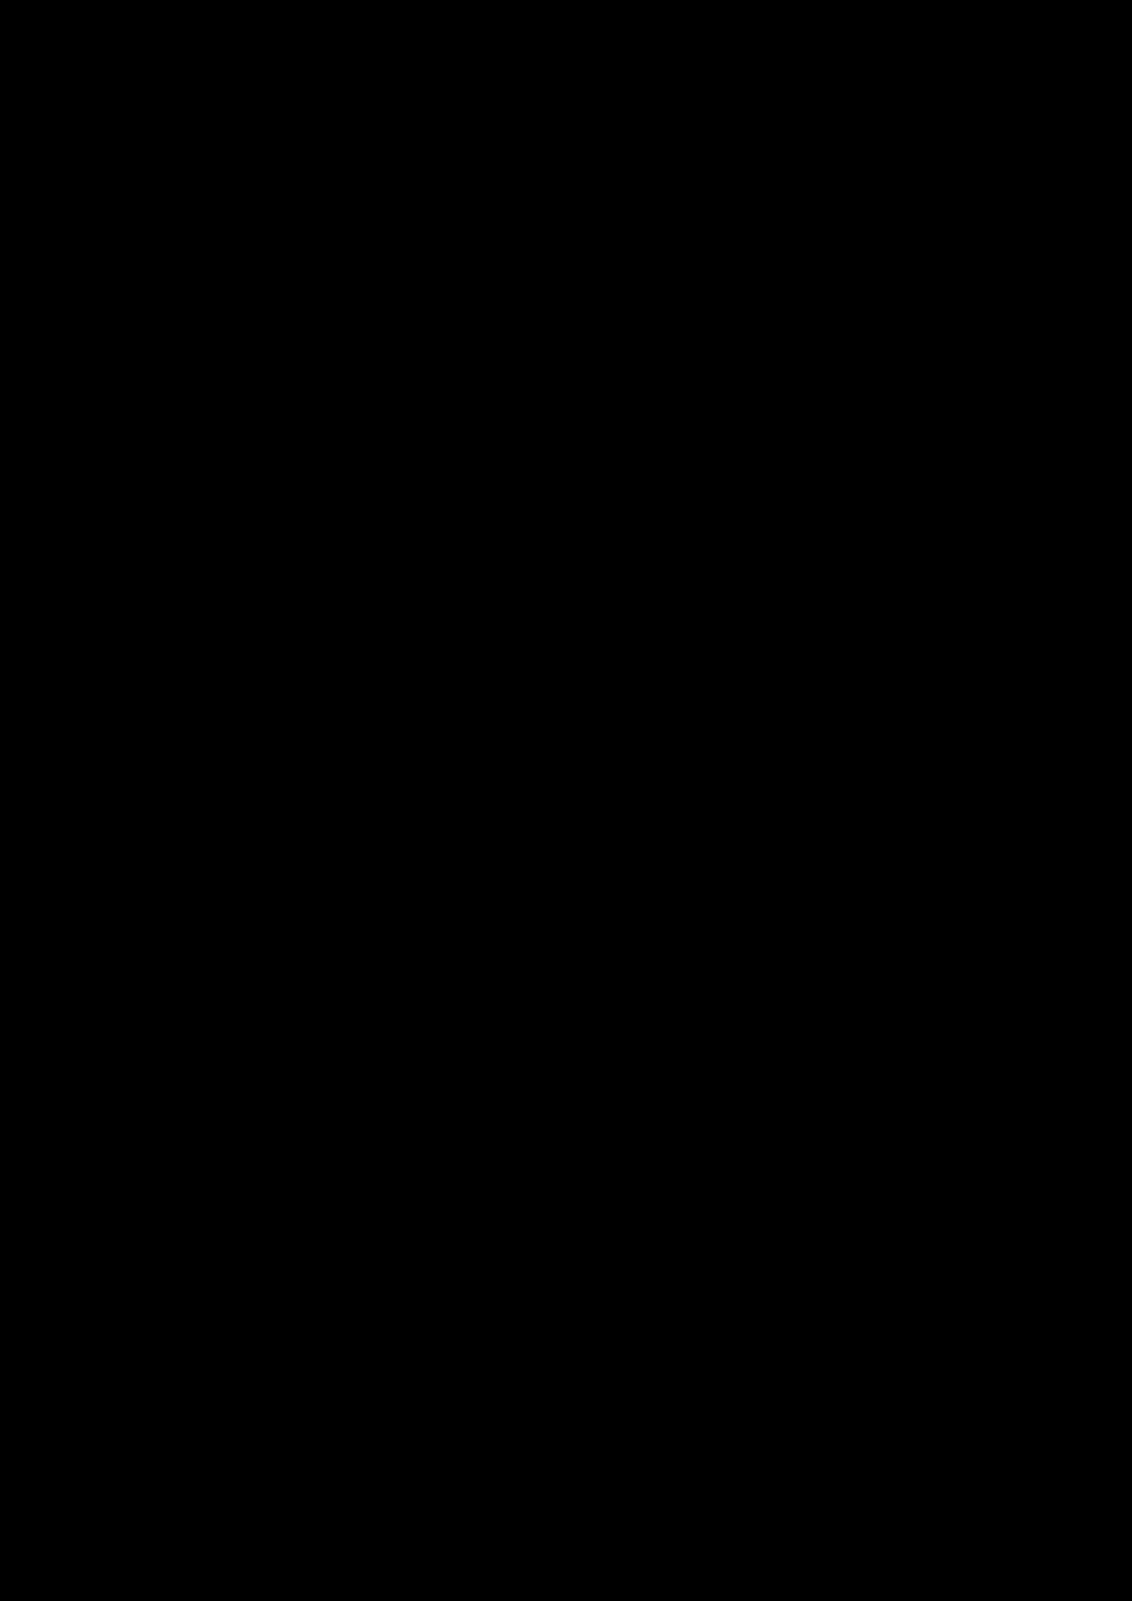 CHujina slide, Image 5